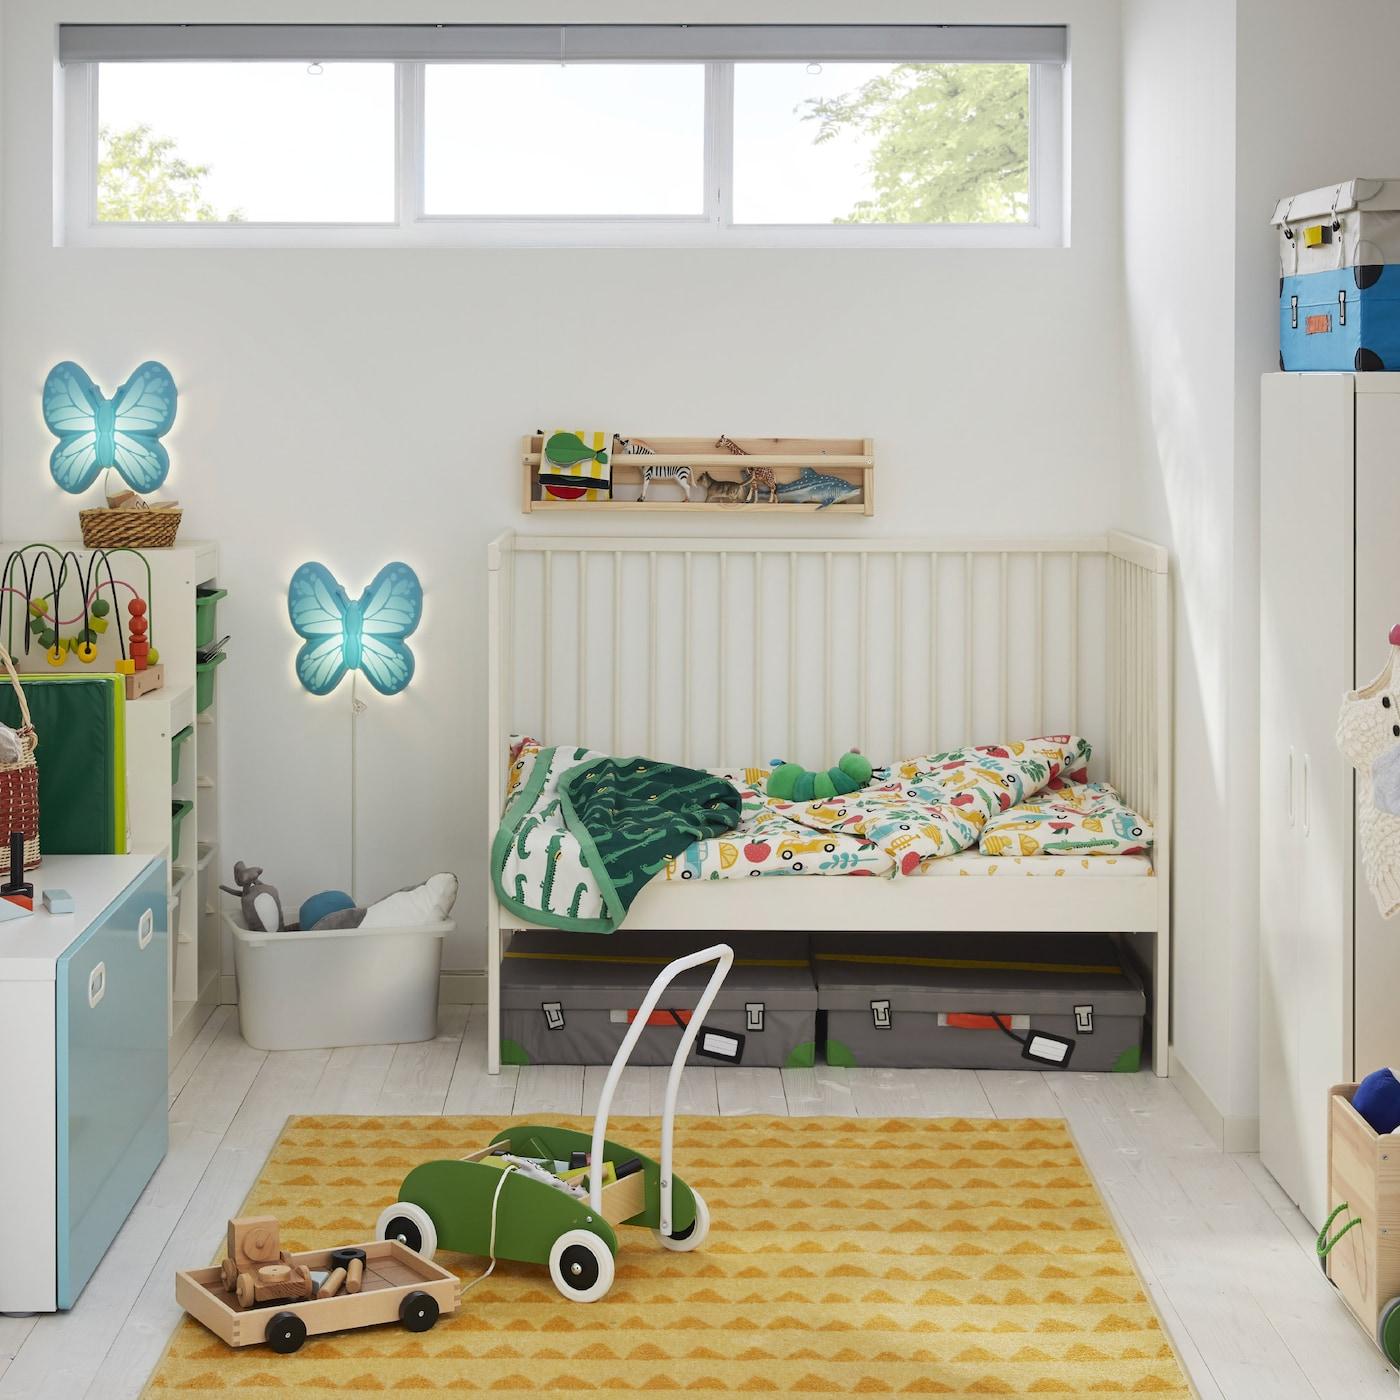 Dečja soba s belim krevecem, žutim tepihom, belim garderoberom, zelenim kamiončićem i zidnim lampama u obliku leptira.